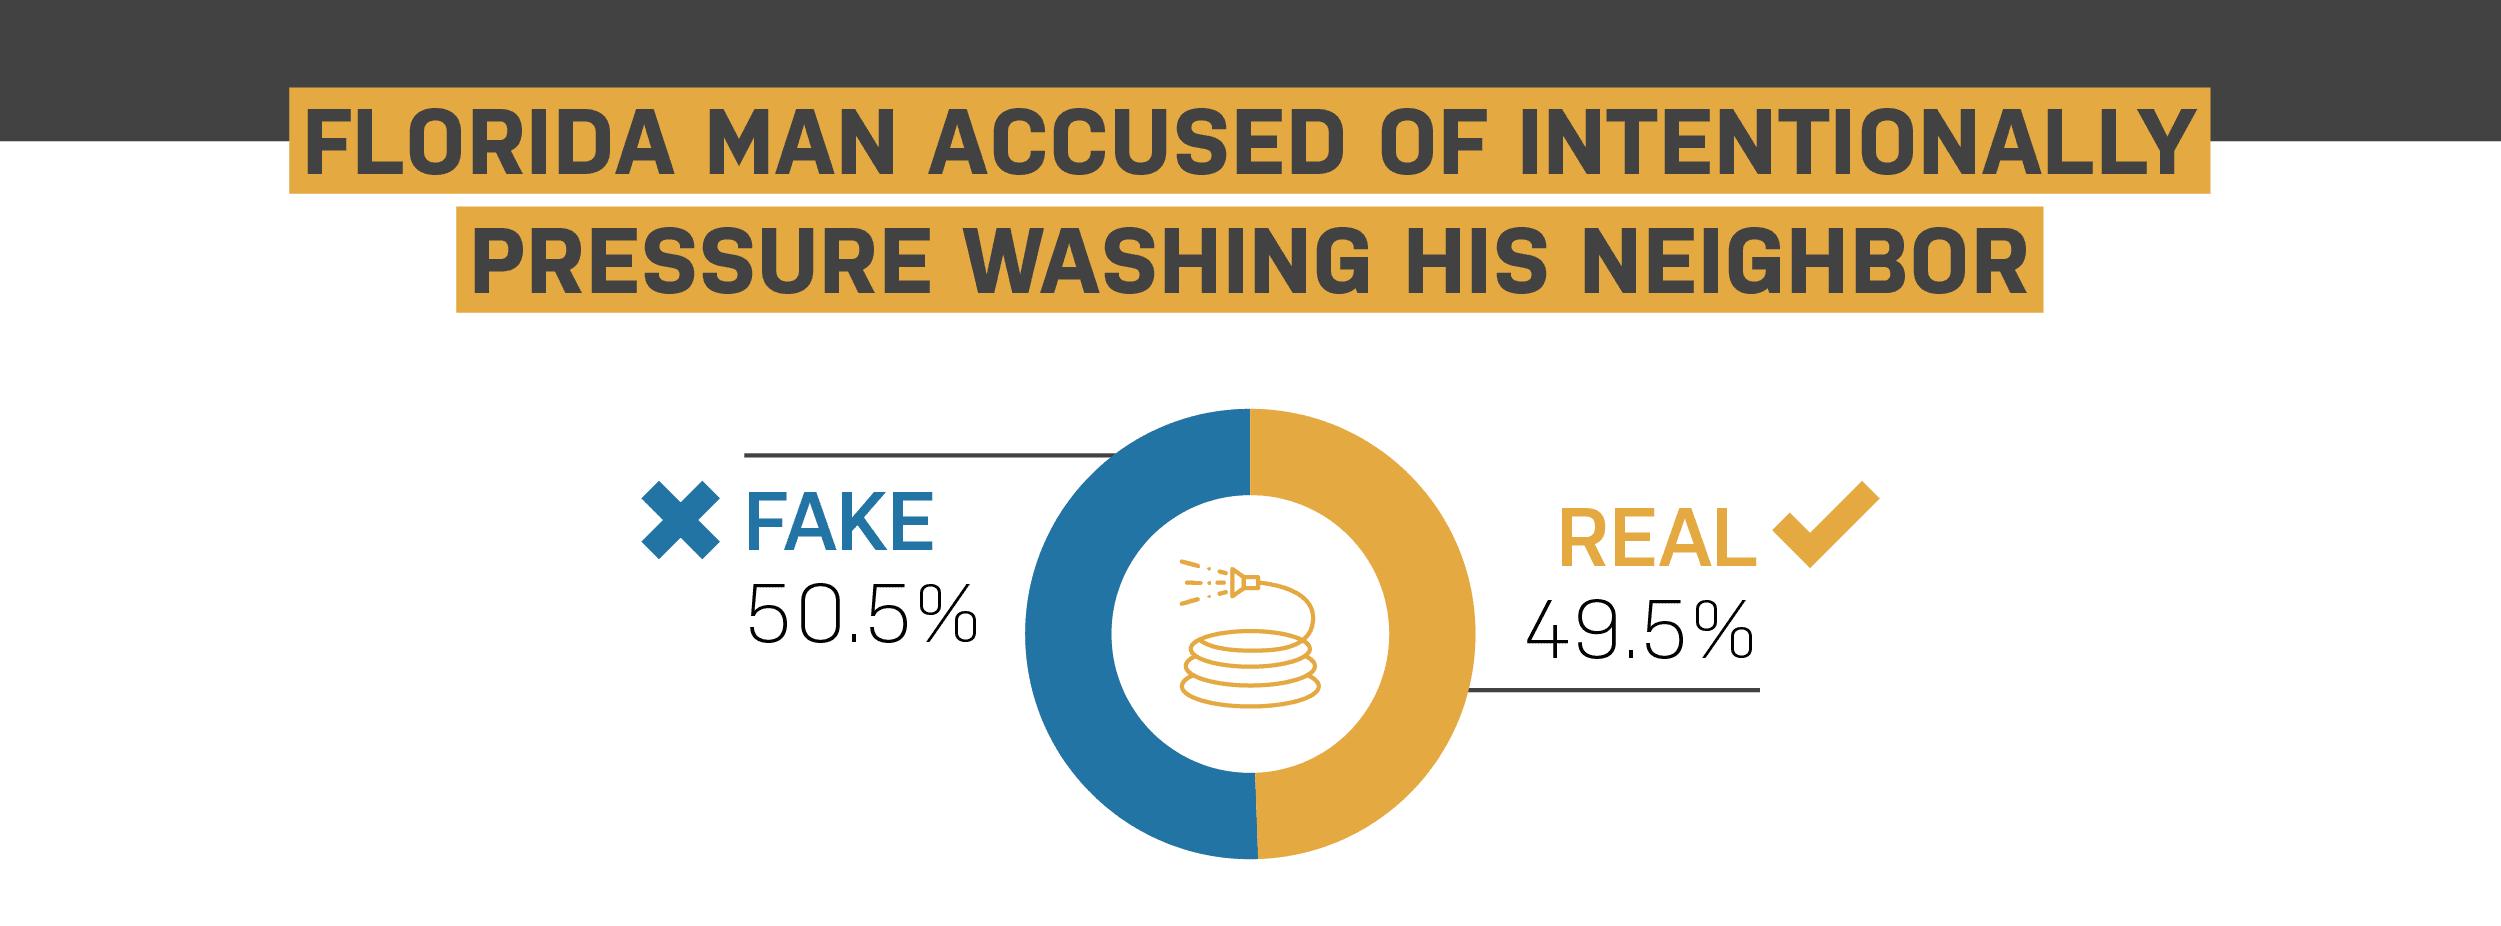 florida-man-pressure-washing-neighbor